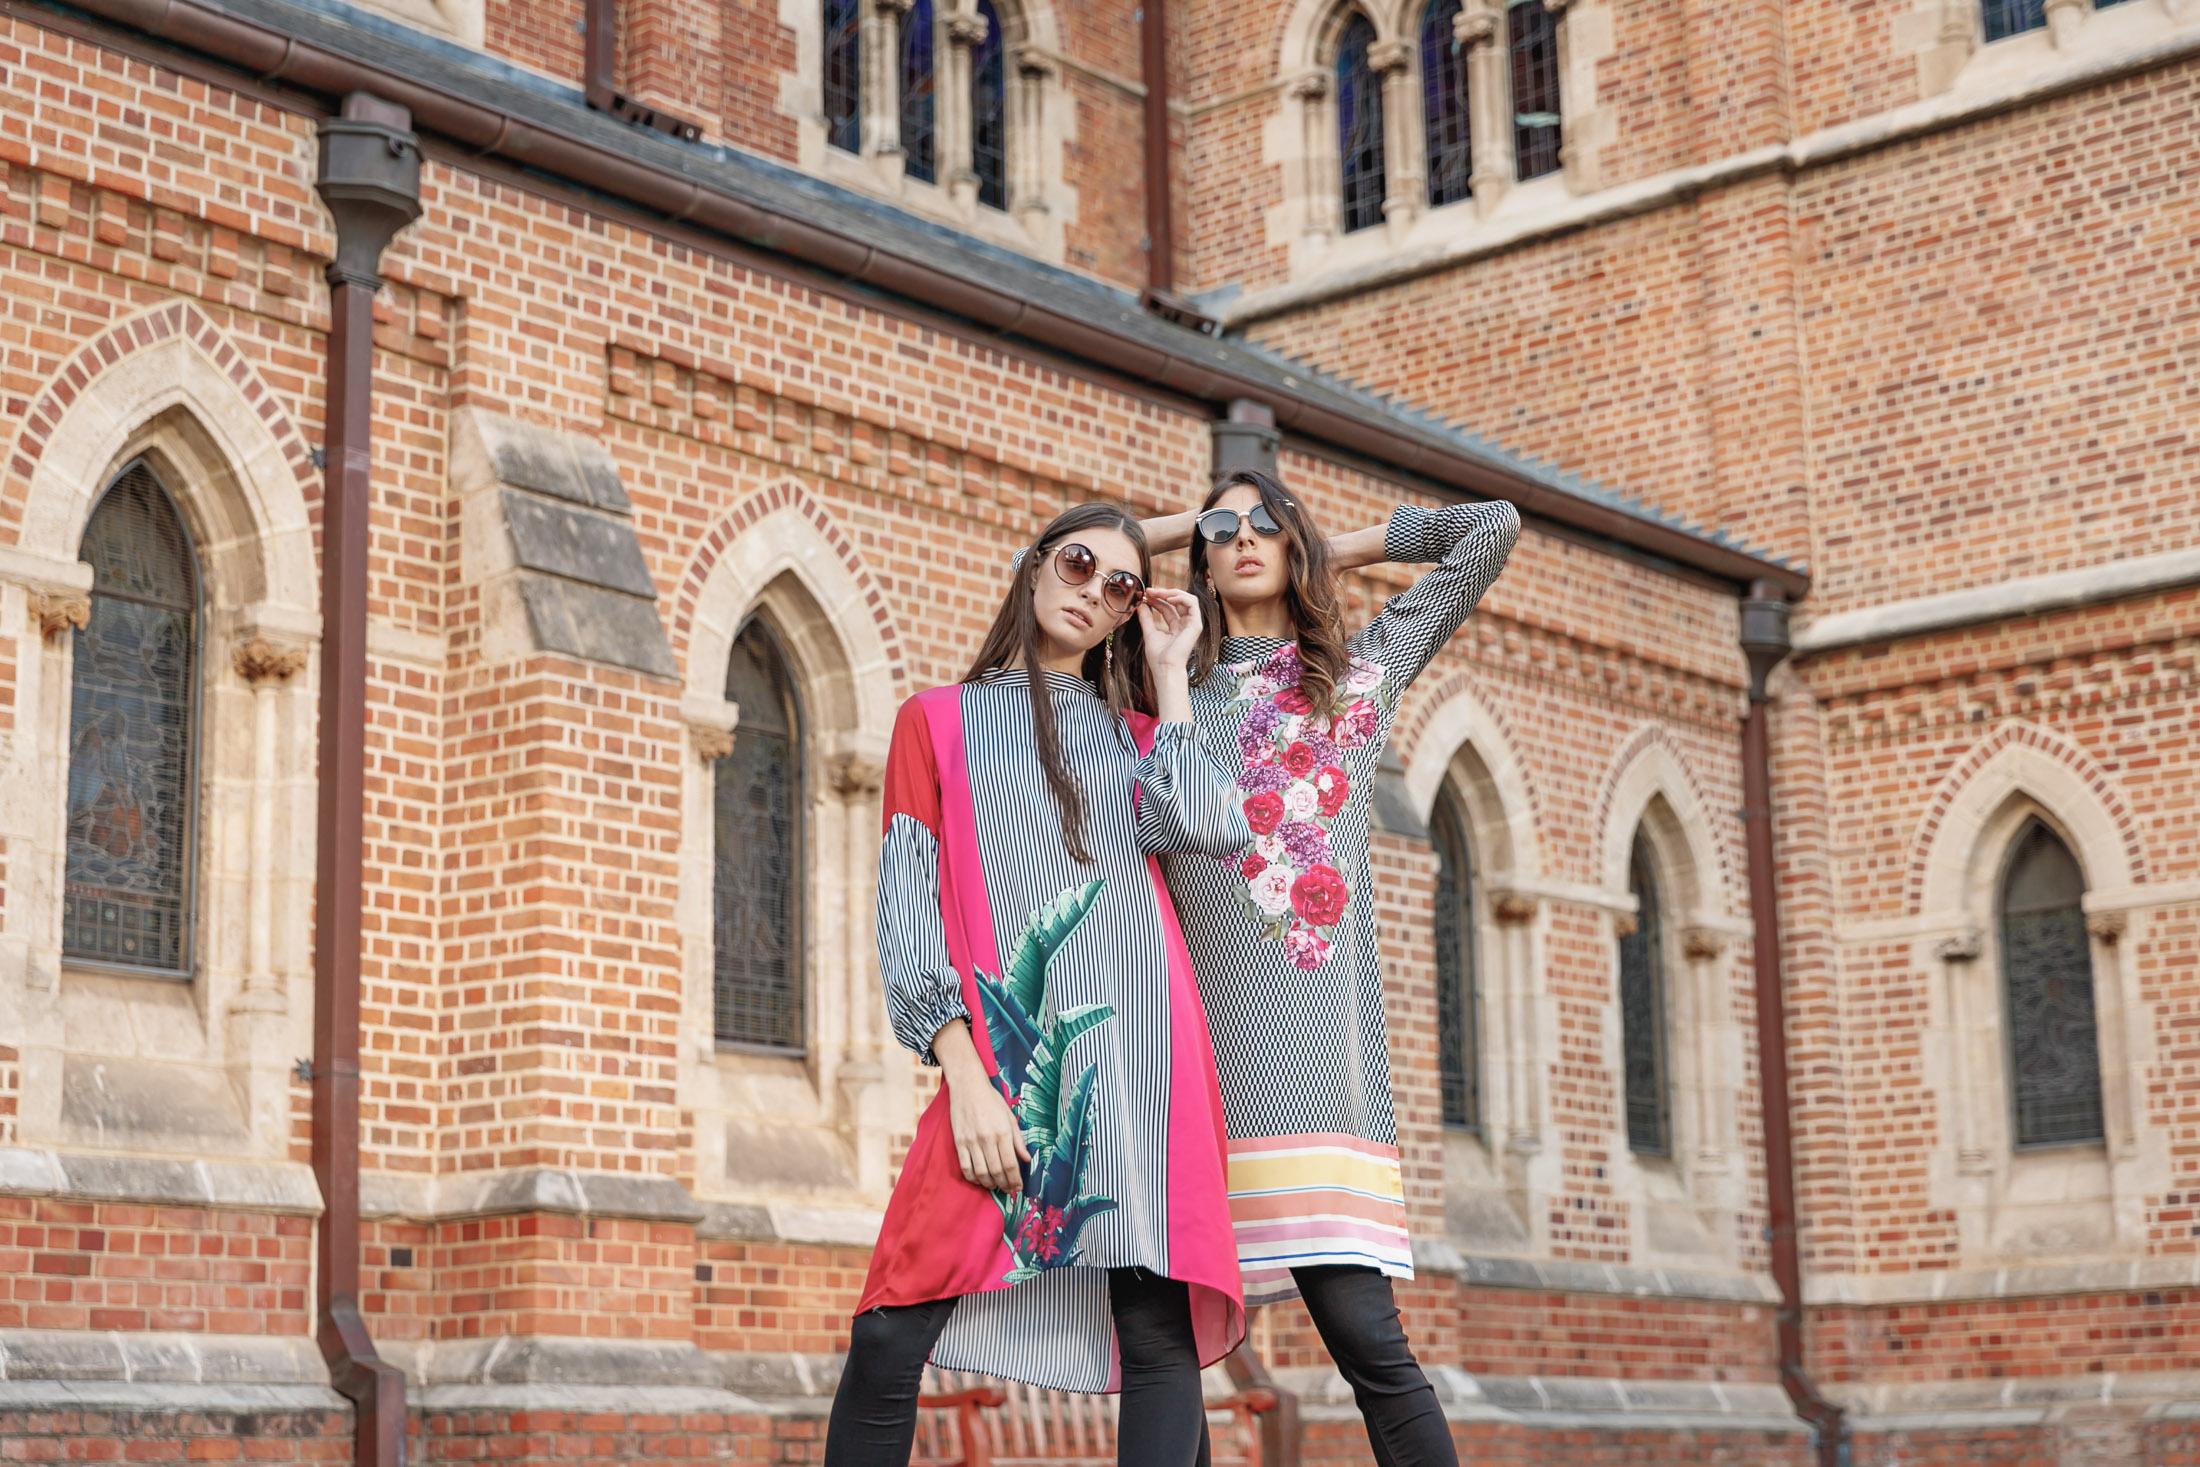 Ammon_Creative-Fashion_Photography-Vogue_Sultana_Bangladesh-Old_Treasury-Perth-013-1795.jpg